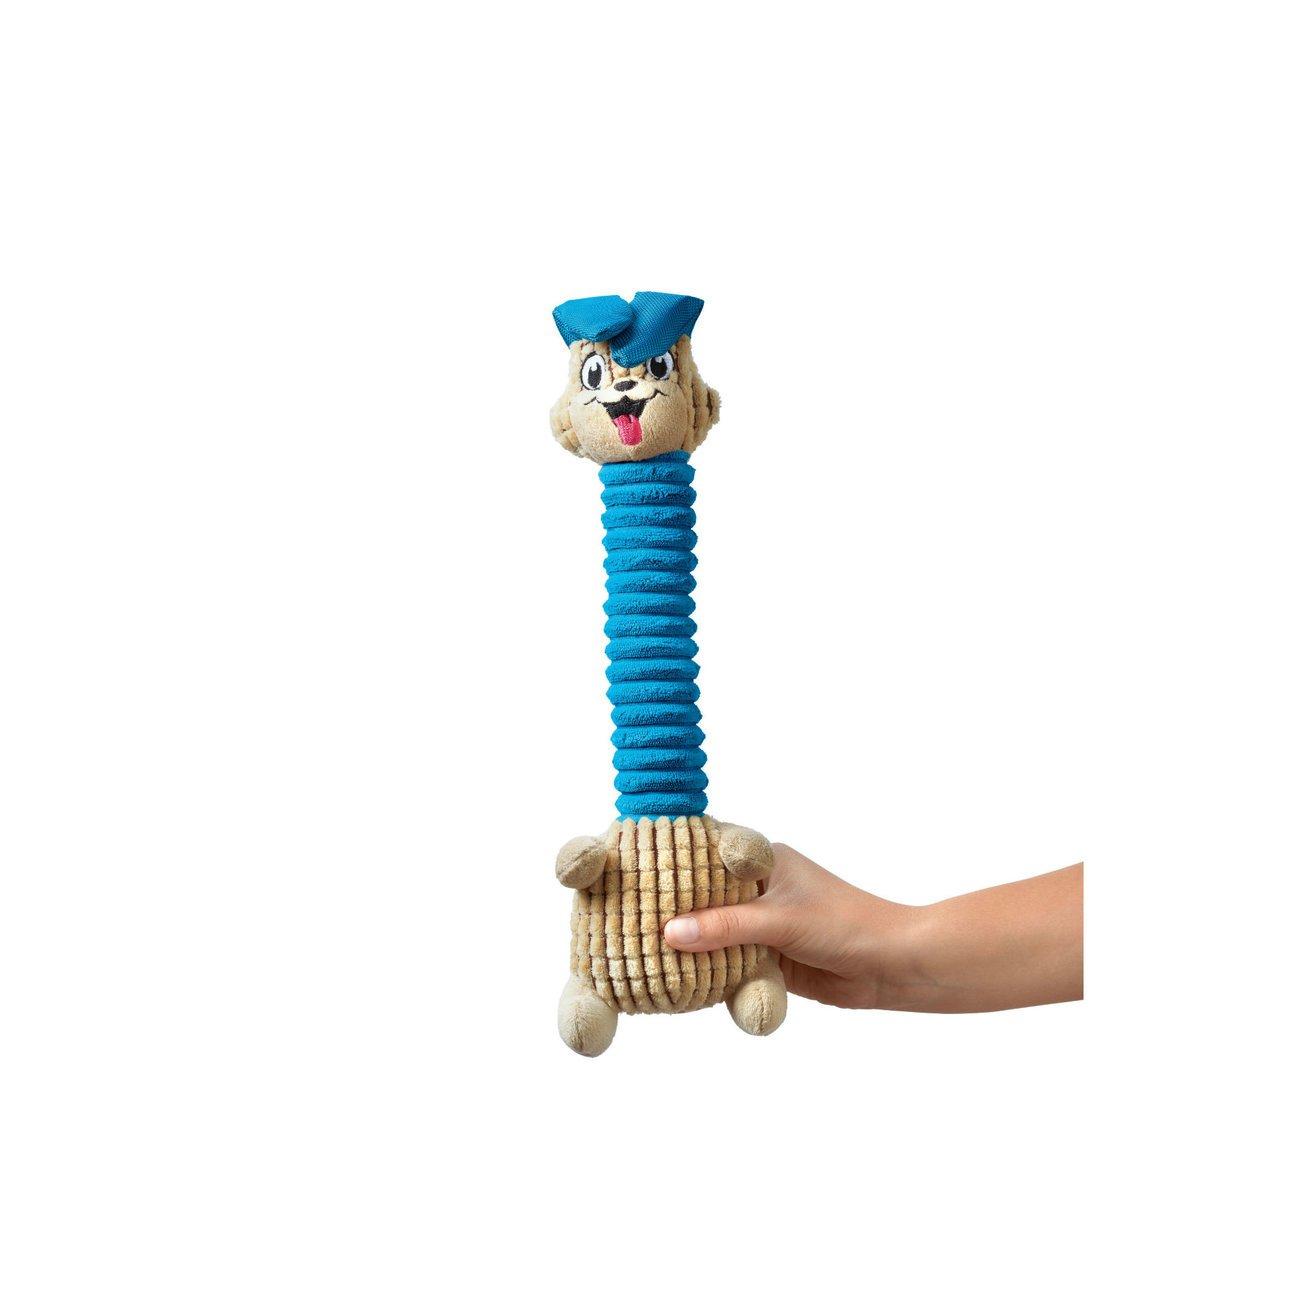 Hunter Hundespielzeug Granby 67452, Bild 3